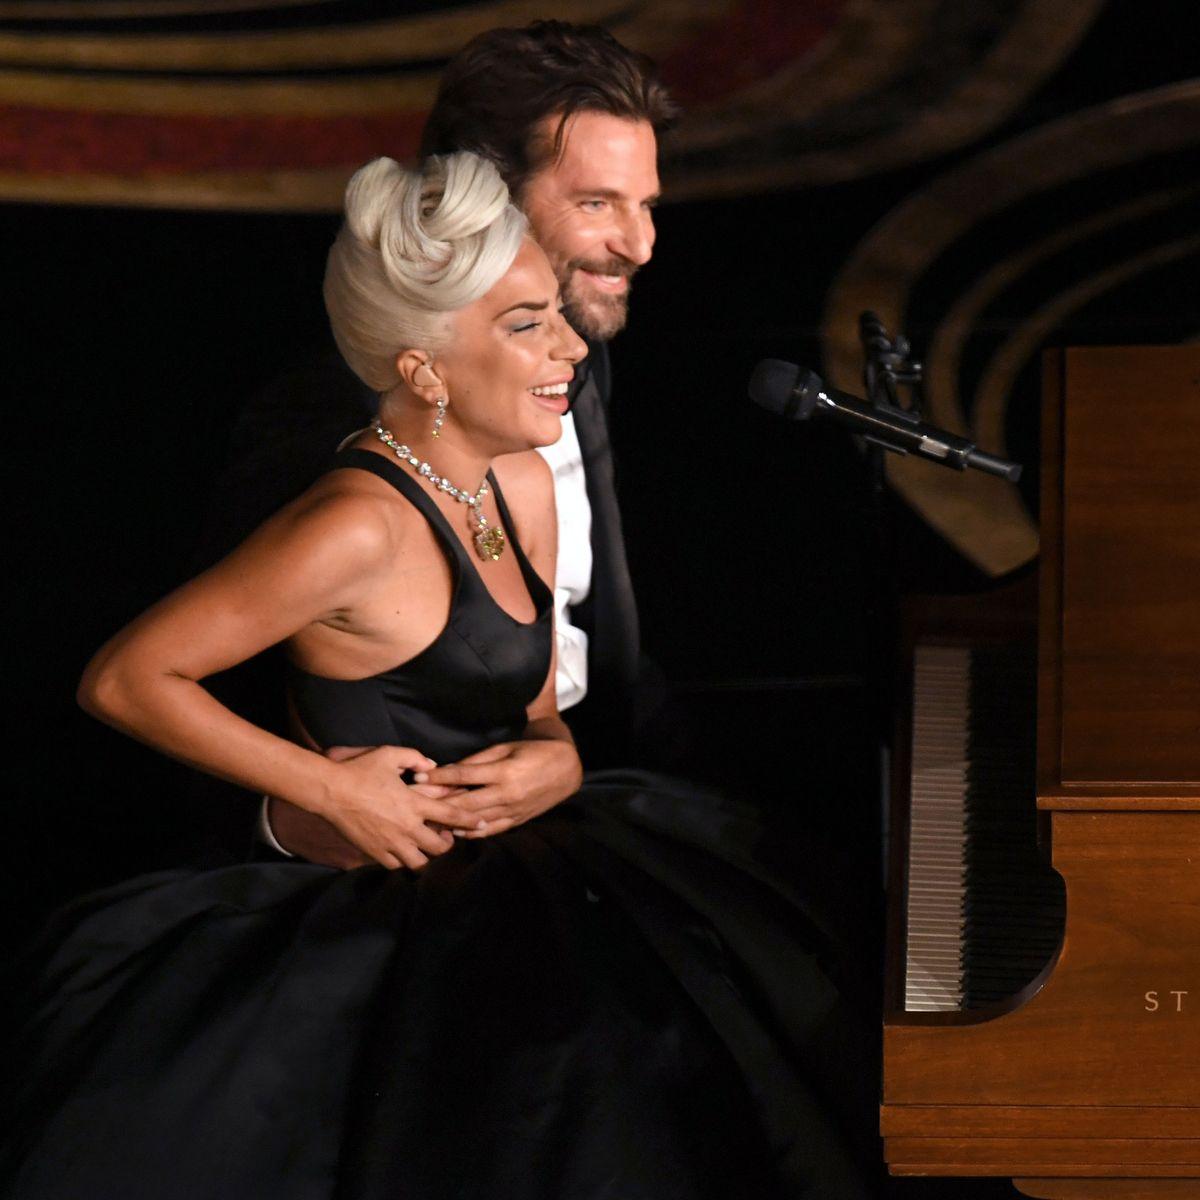 Lady Gaga and Bradley Cooper Nailed 'Shallow' at the Oscars